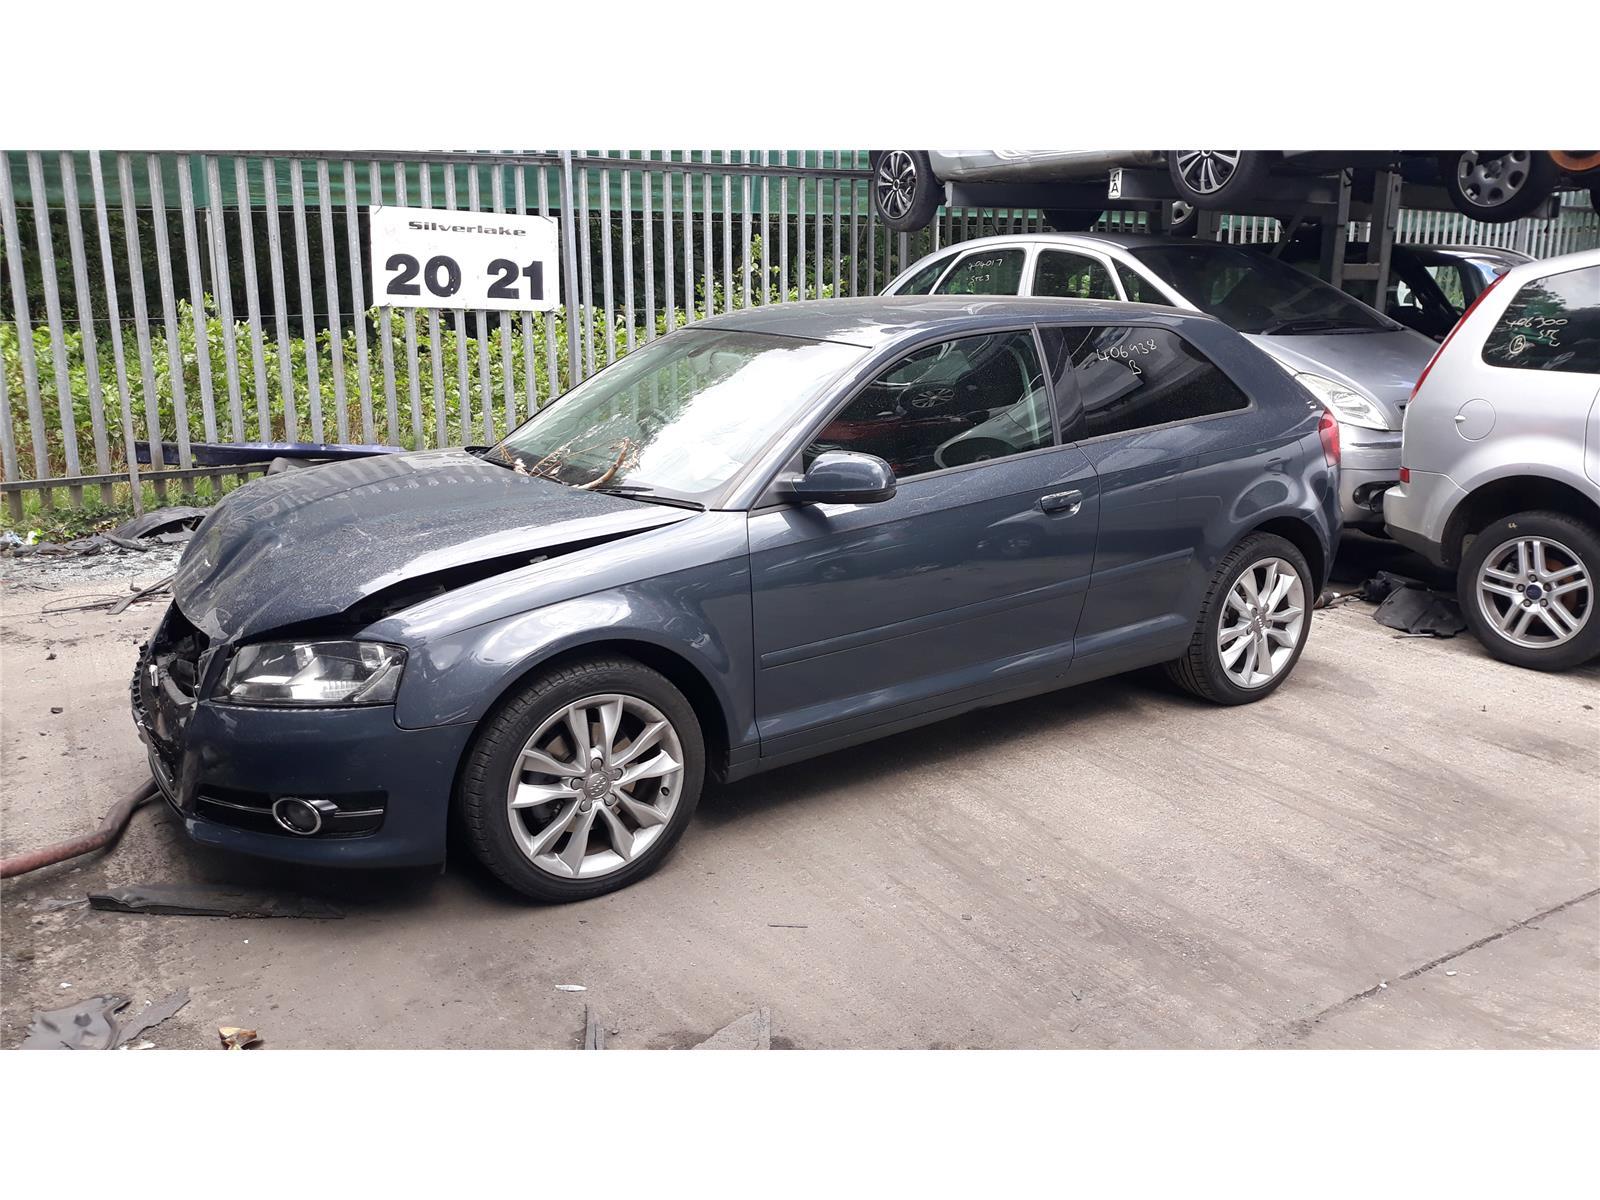 Audi A3 2008 To 2013 Sport 3 Door Hatchback Scrap Salvage Car S3 Fuse Box